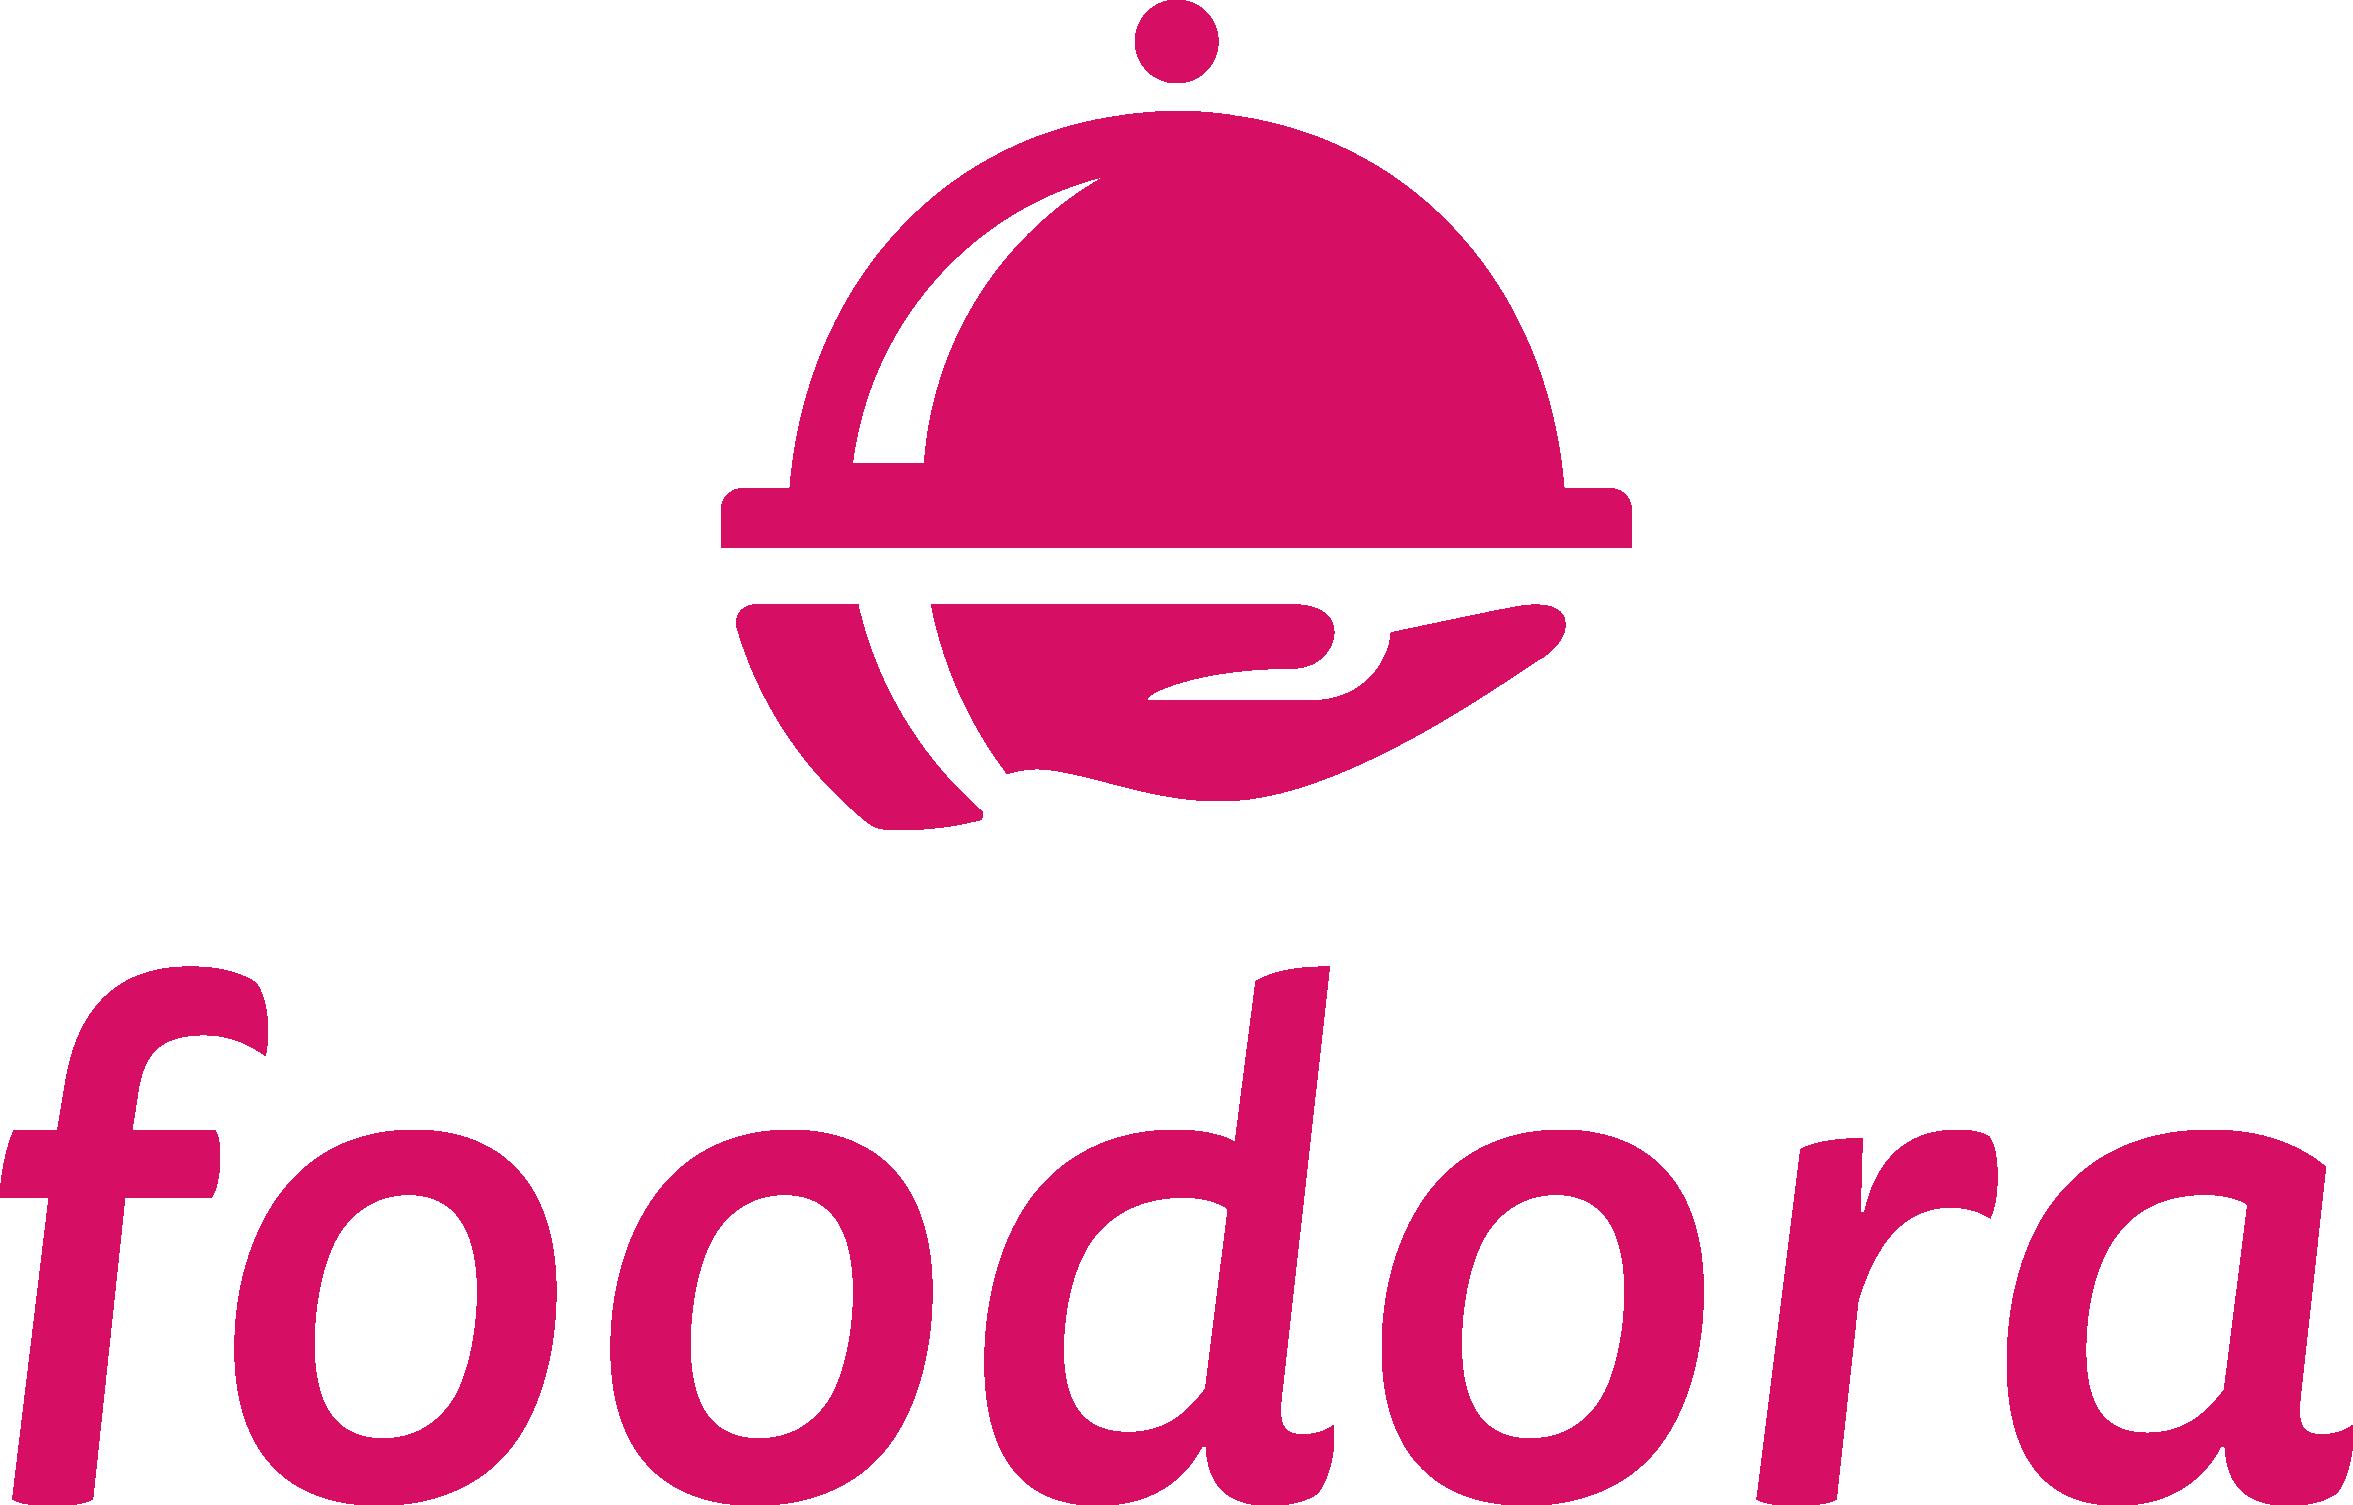 Foodora logo_foodora